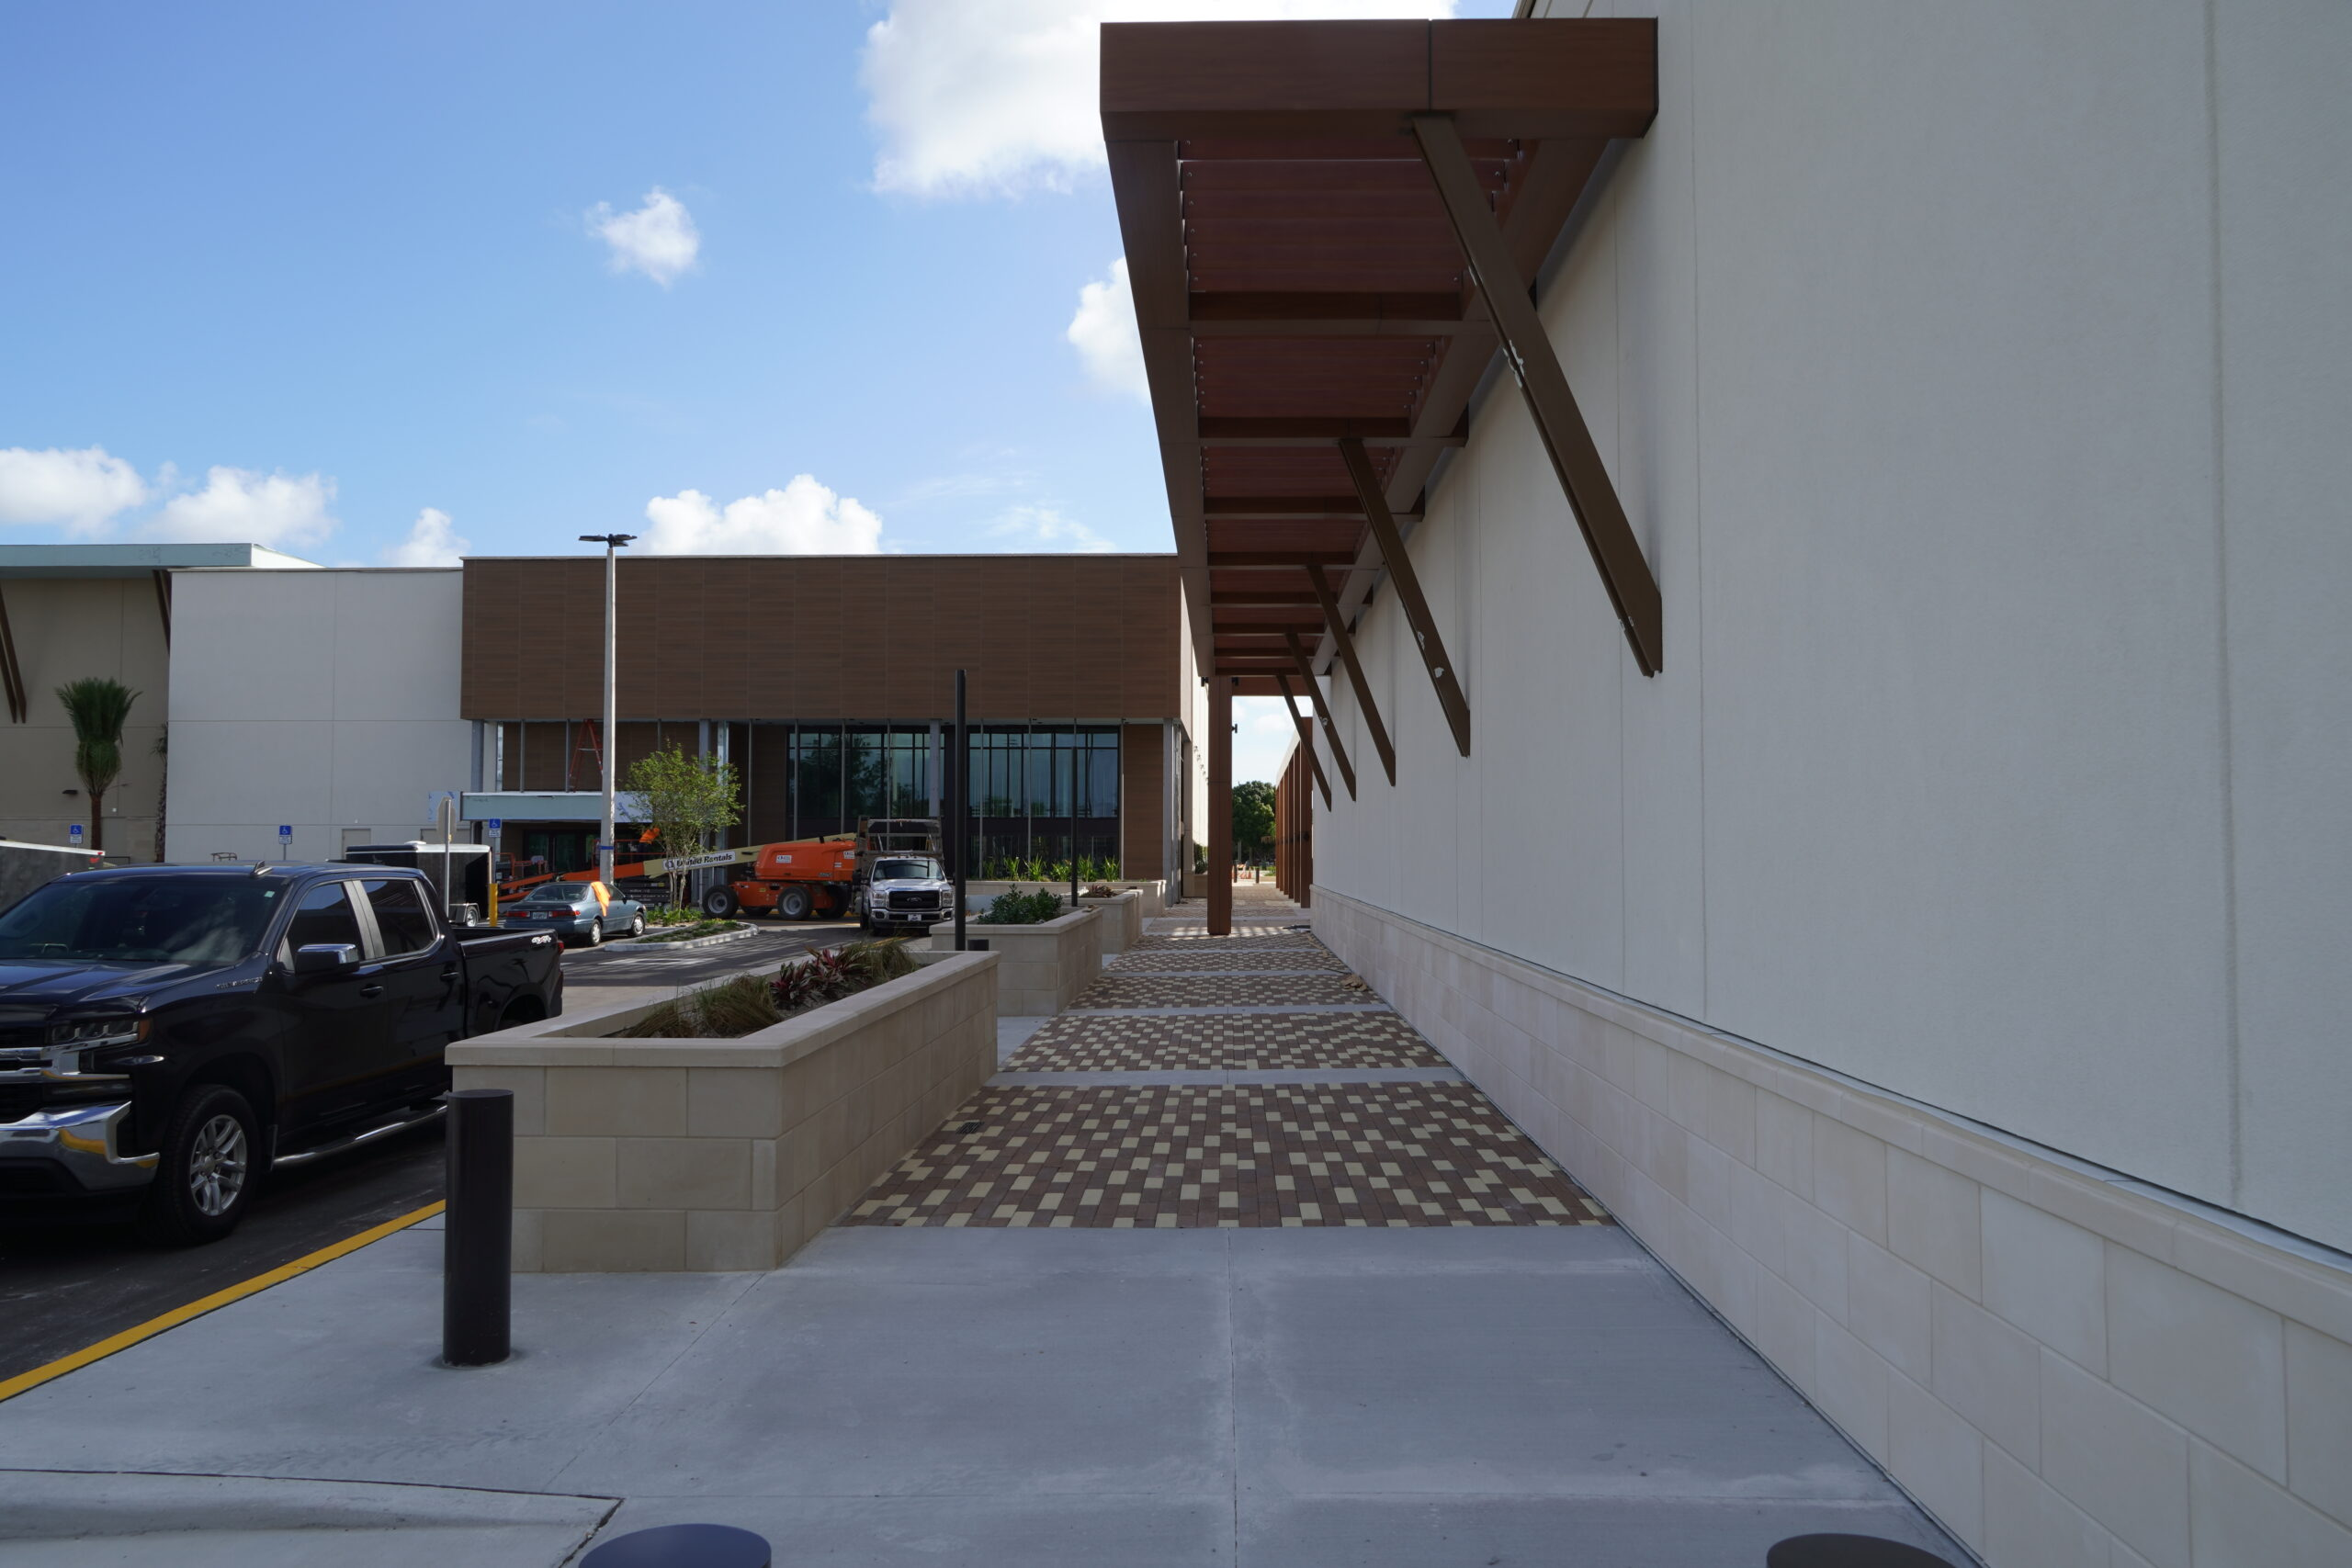 Coastland Center Commercial Pavers A